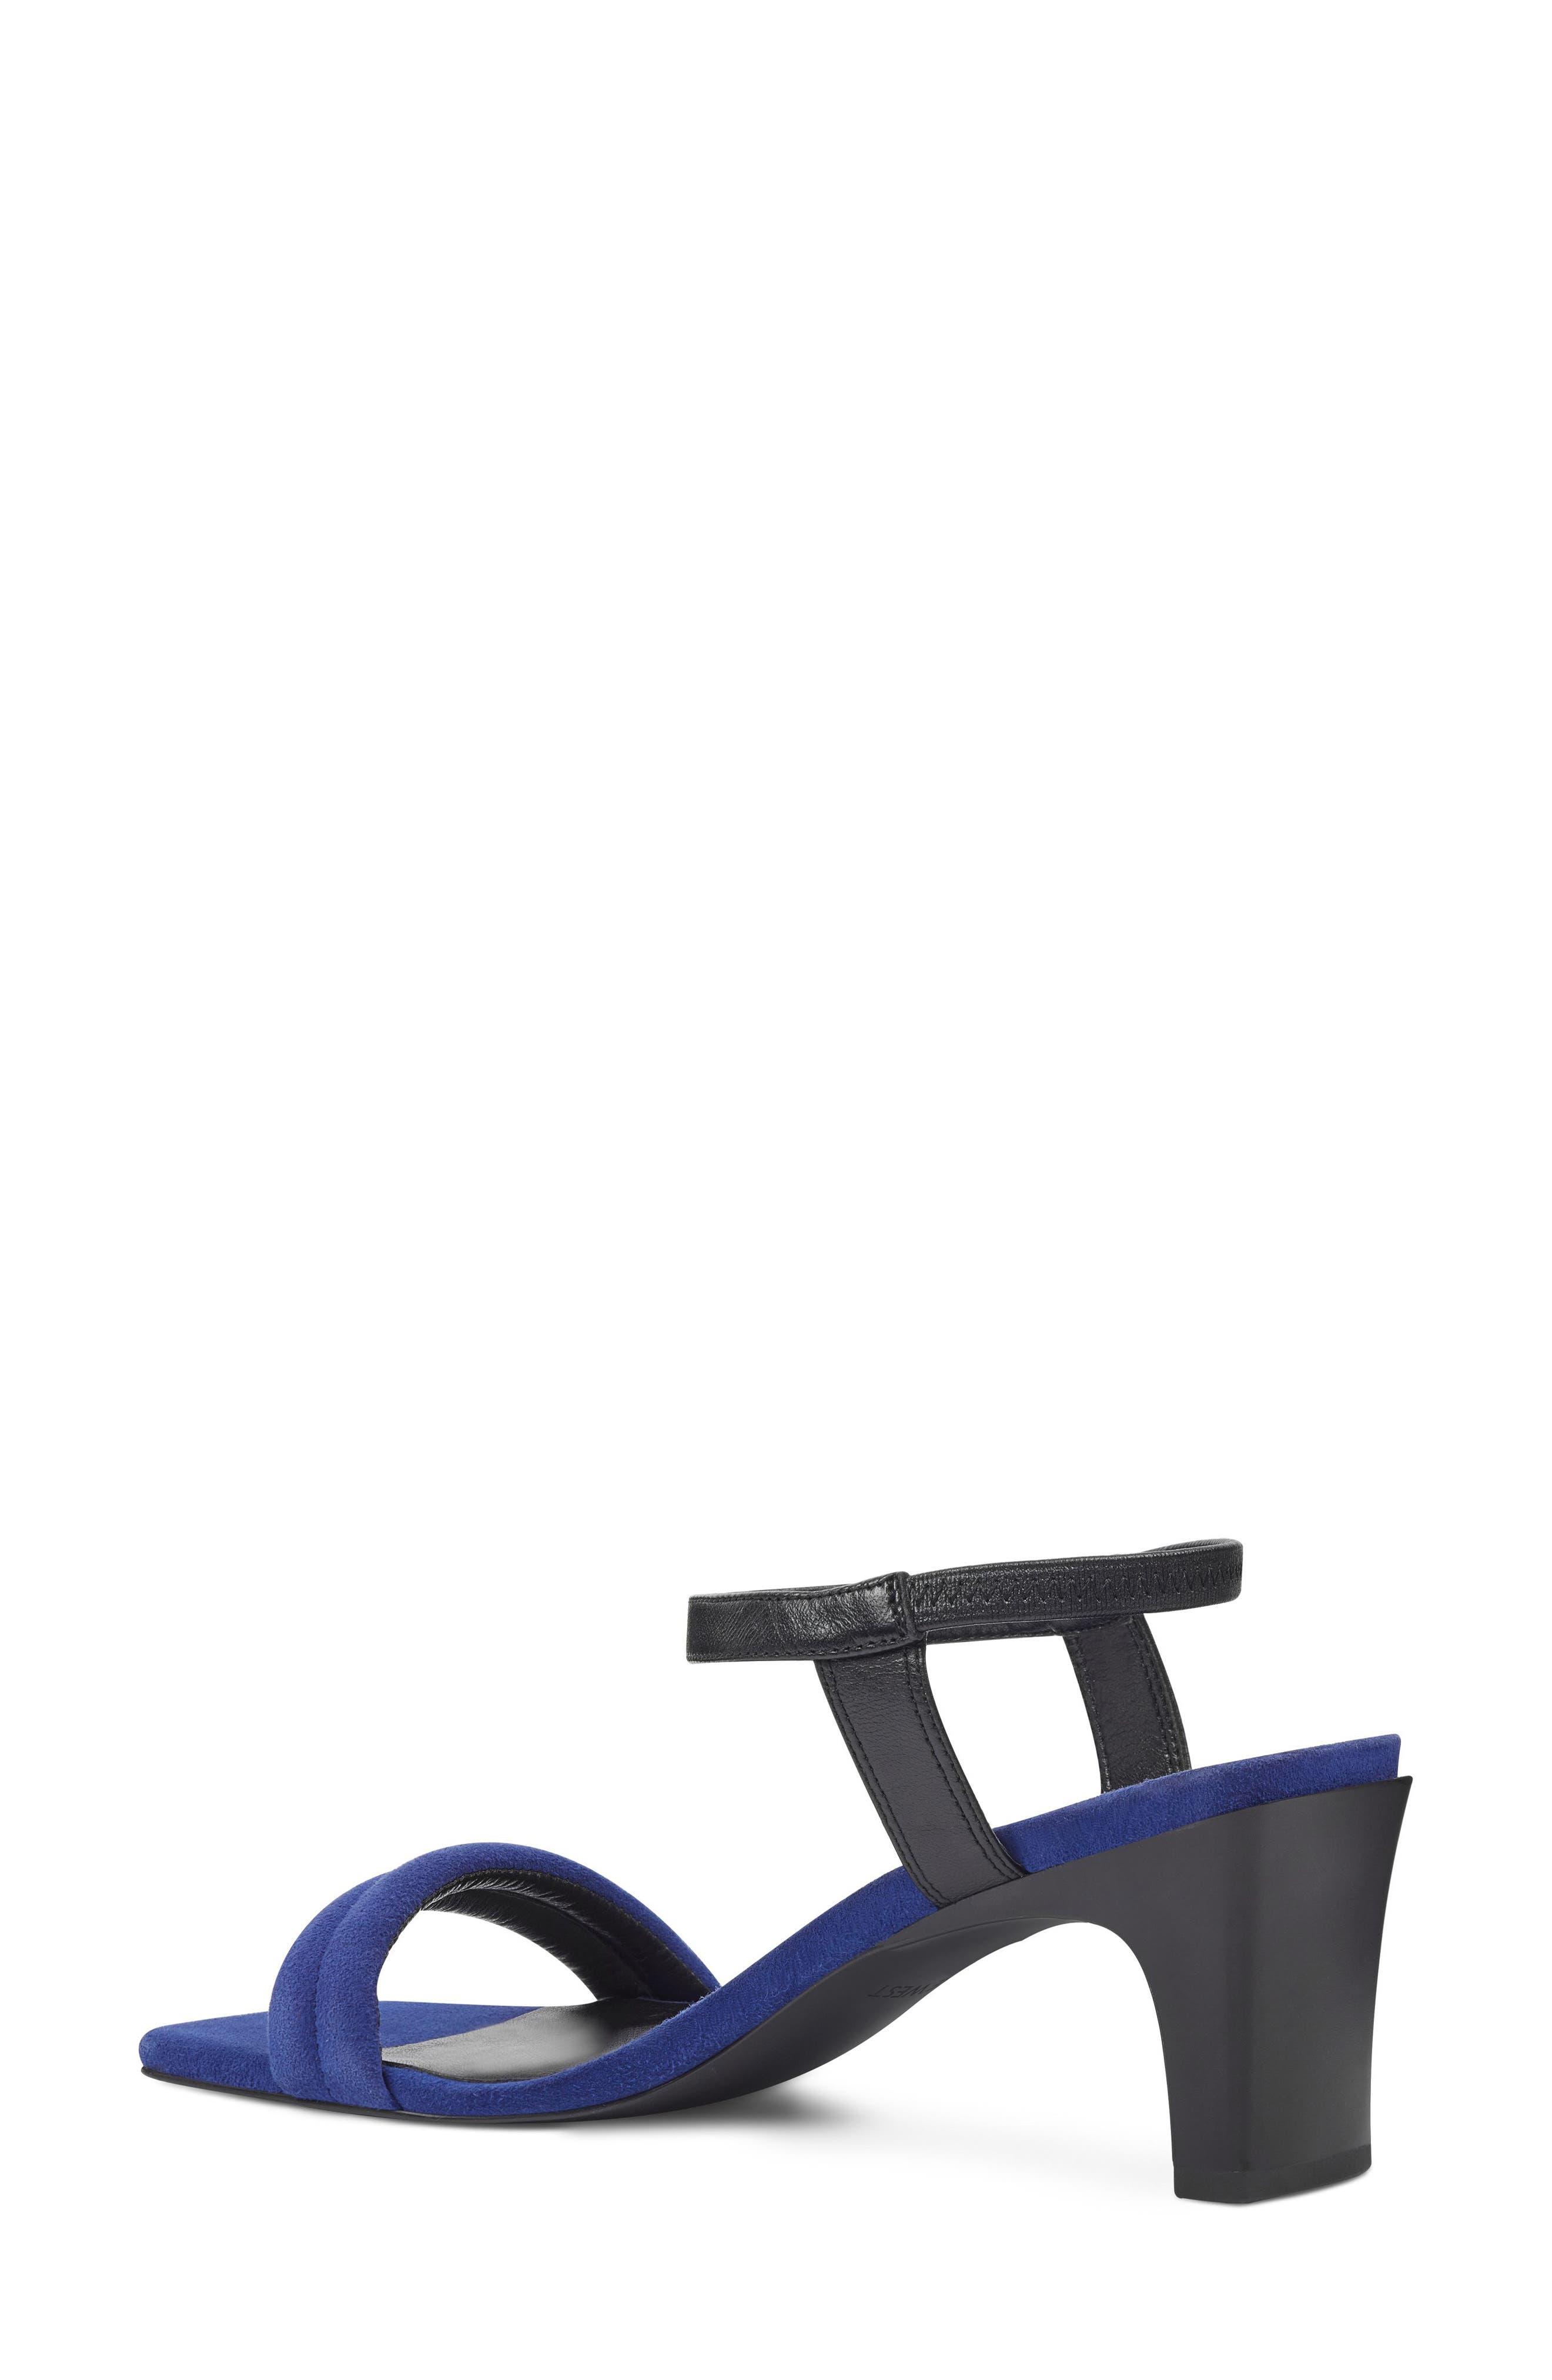 Urgreat Ankle Strap Sandal,                             Alternate thumbnail 2, color,                             Dark Blue/ Black Suede